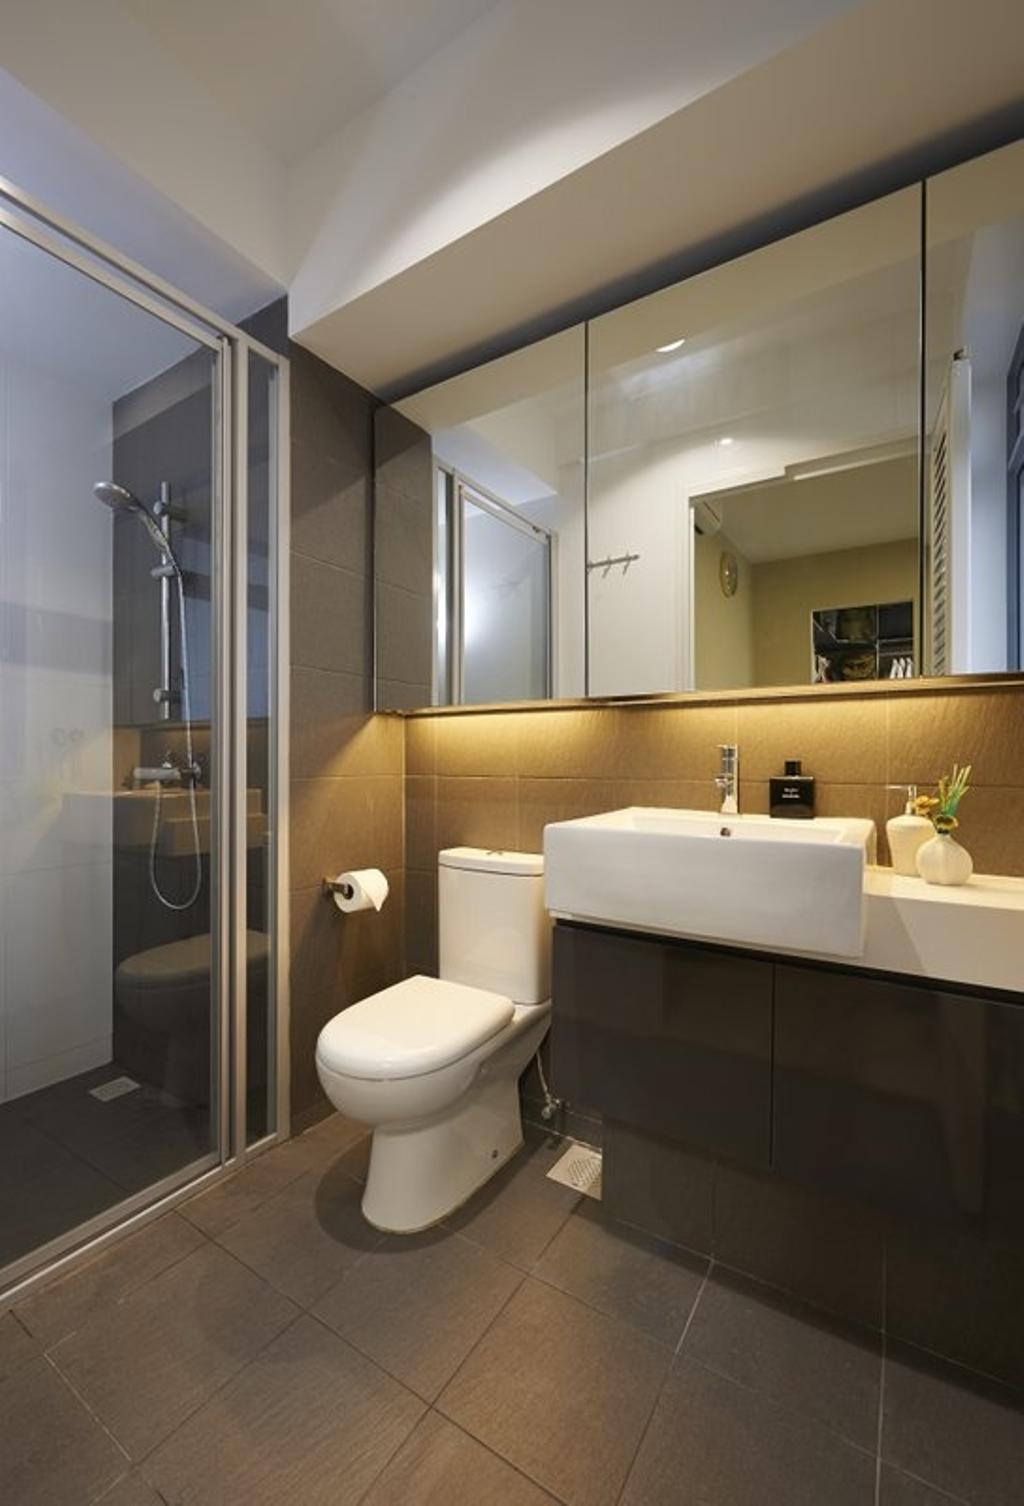 Contemporary, HDB, Bathroom, Pasir Ris One, Interior Designer, Spire Id, Bathroom Vanity, Bathroom Sink, Mirror, Shower, Shower Area, Shower Head, Bathroom Tiles, Sink, Toilet, Indoors, Interior Design, Room